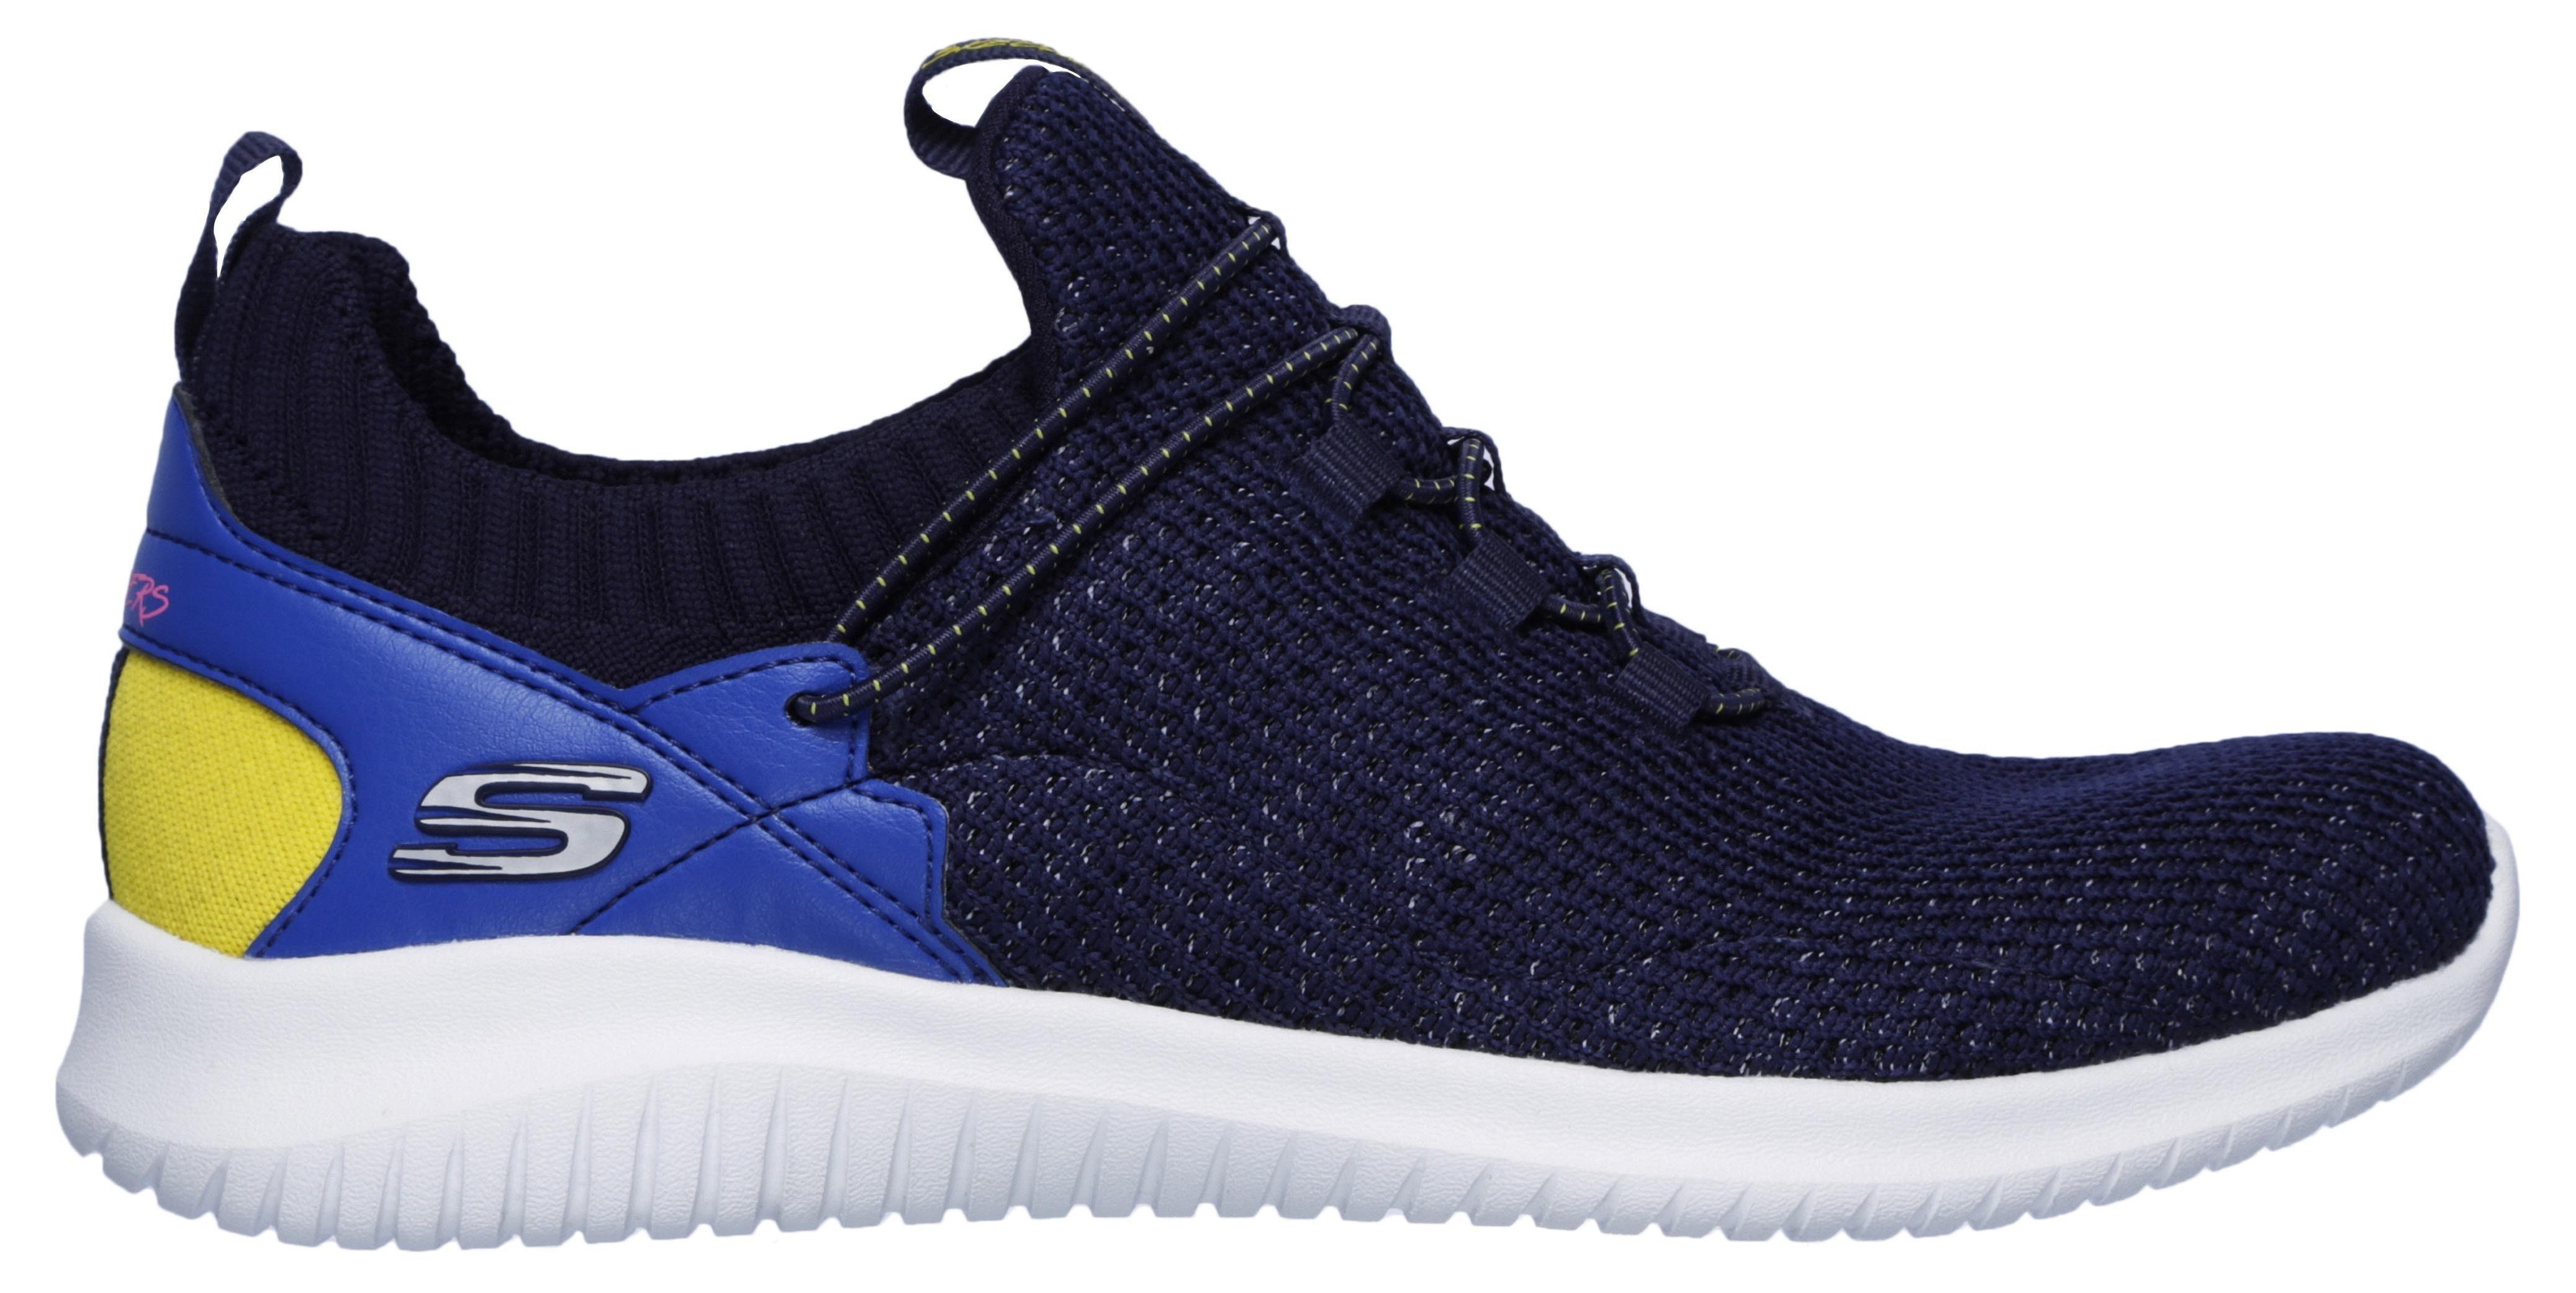 Skechers »Ultra Flex Bright Future« Slip On Sneaker in sportivem Design online kaufen | OTTO